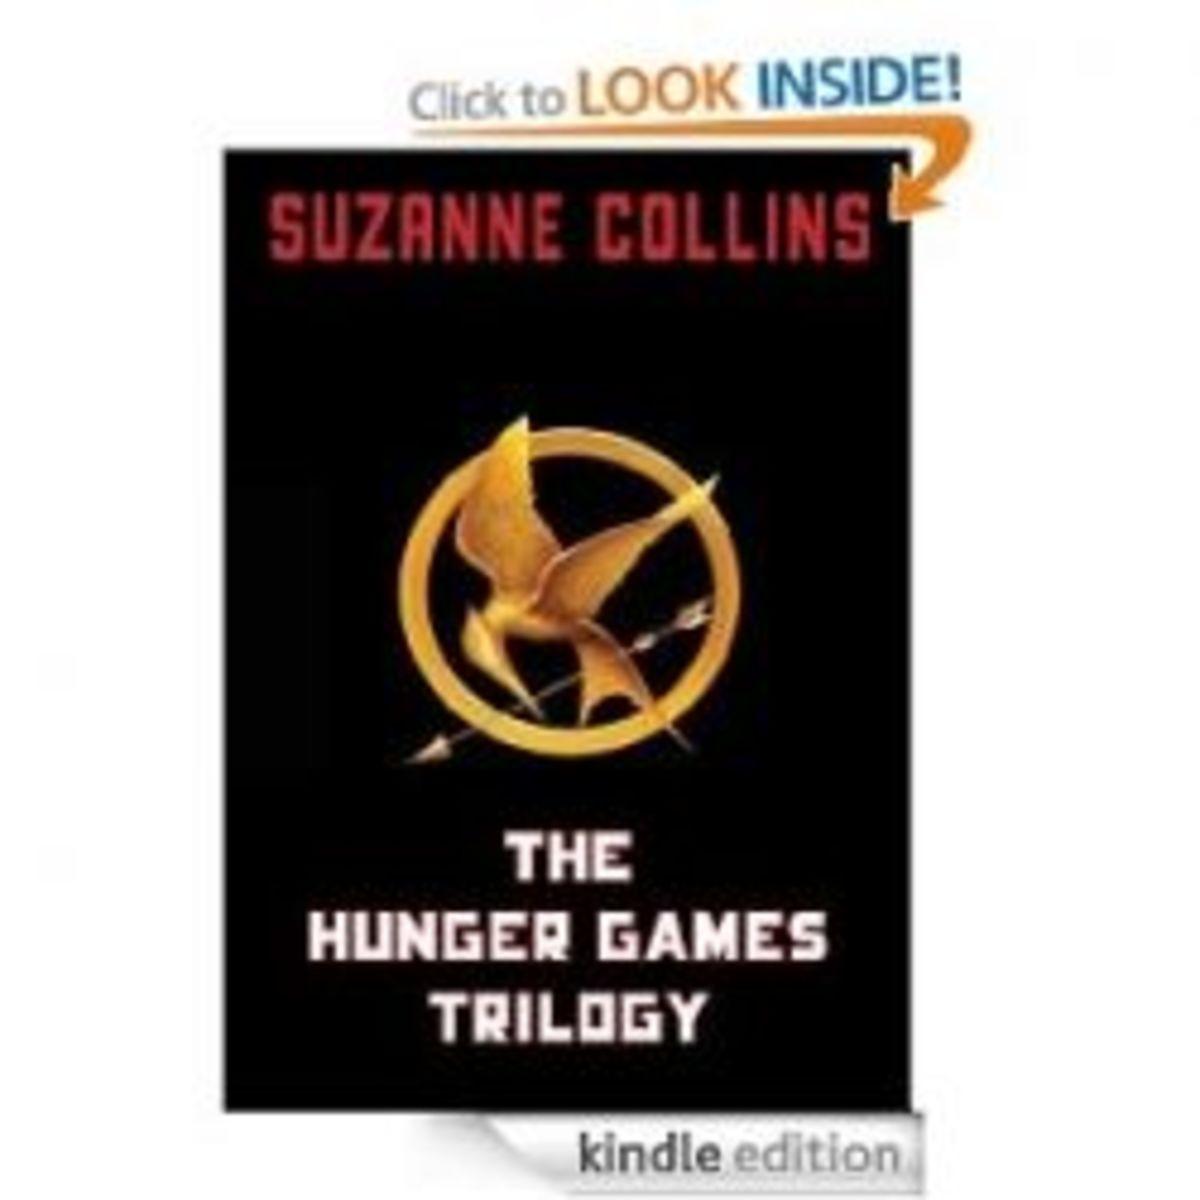 Hunger games pics